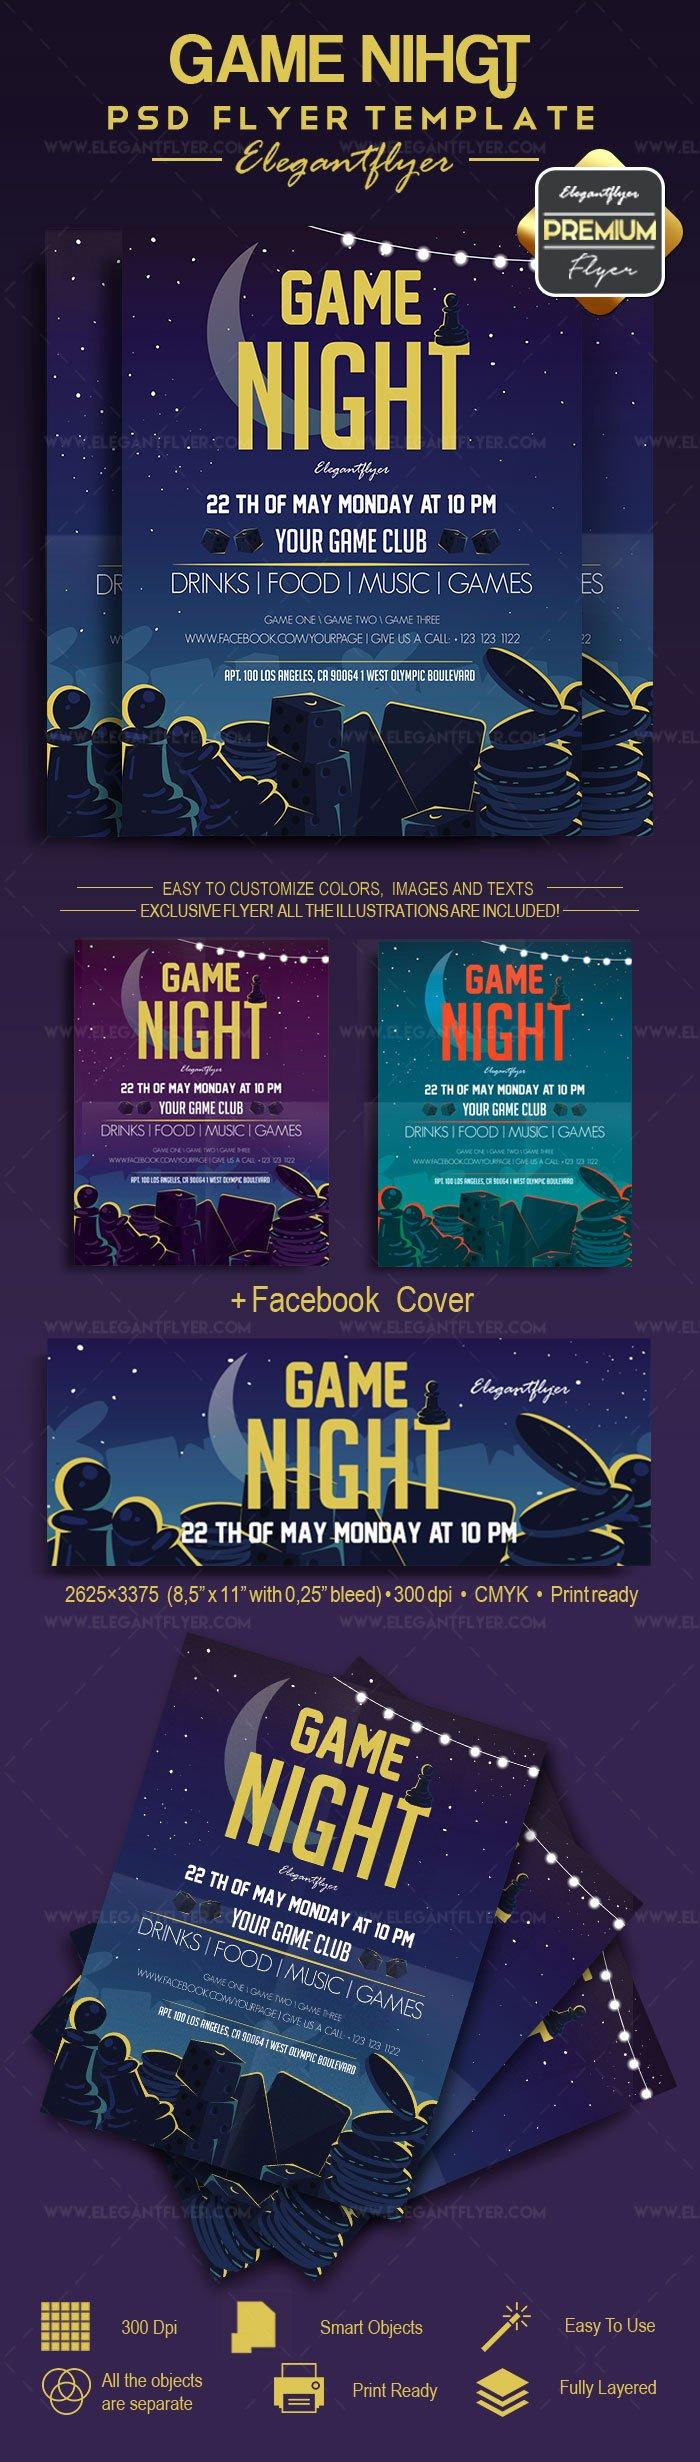 Game Night Flyer Template Elegant Game Night – Flyer Psd Template – by Elegantflyer